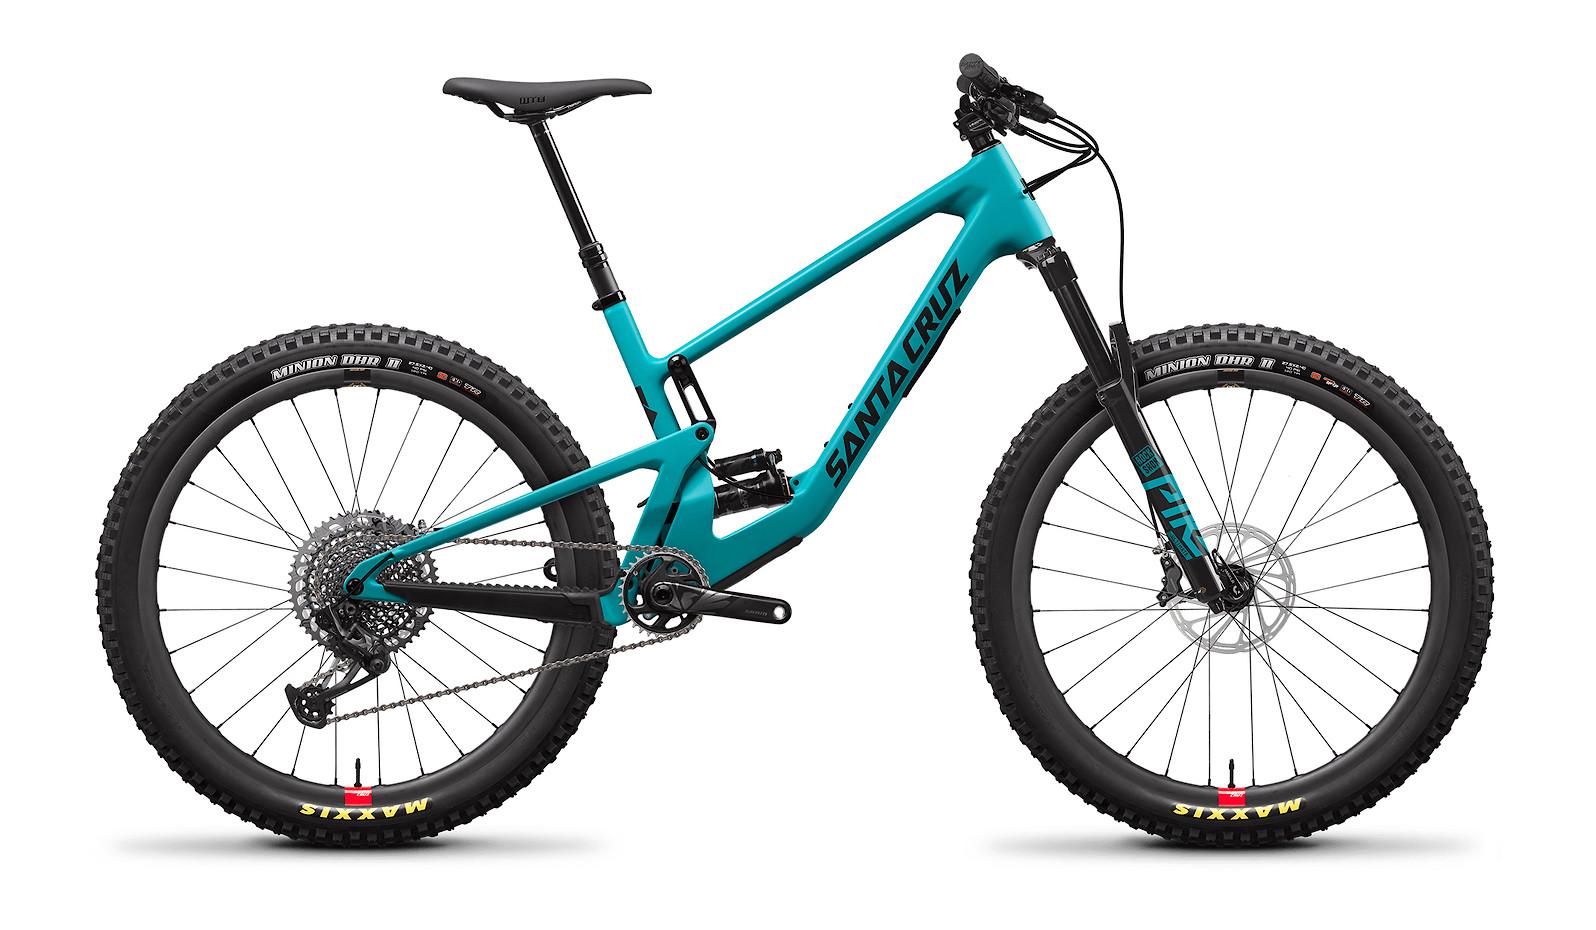 2021 Santa Cruz 5010 Carbon CC X01 (Loosely Blue and Black, with Santa Cruz Reserve Carbon rims)